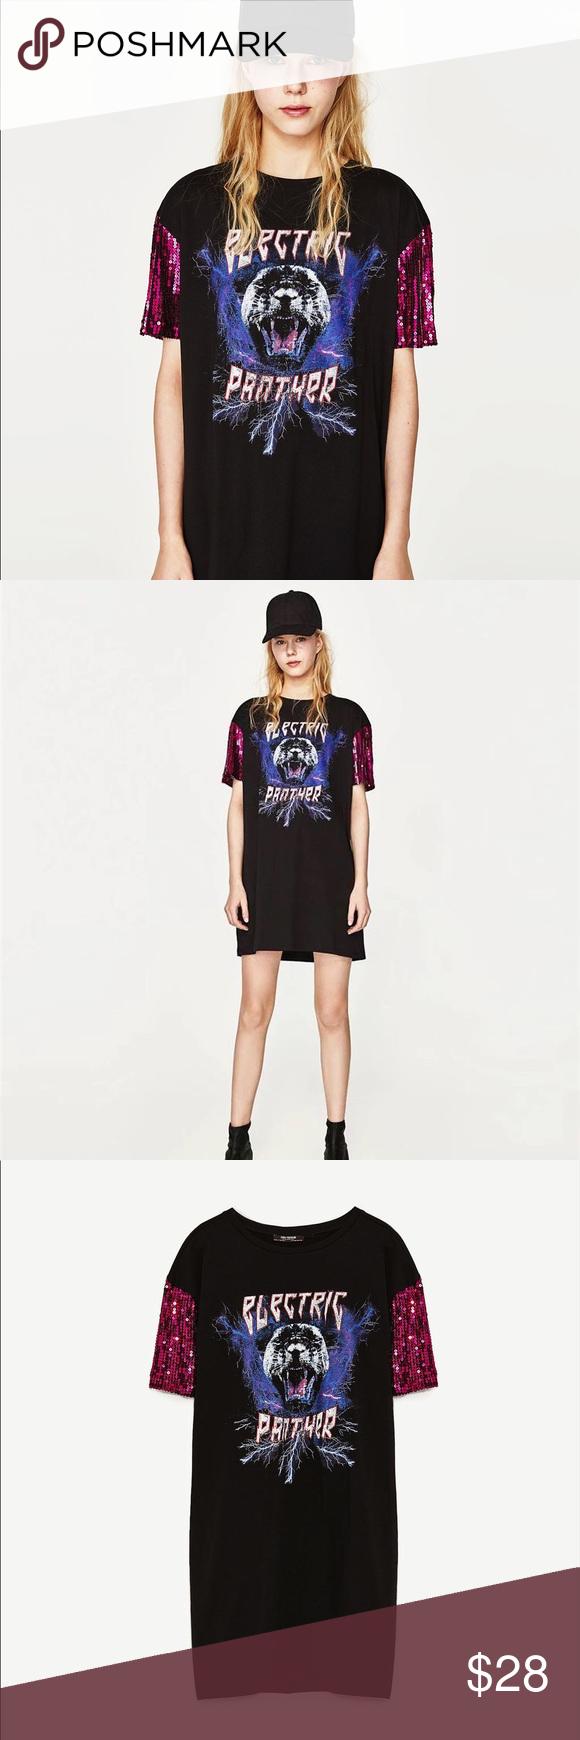 30242e1e NWT Zara Electric Panther Sequined T-Shirt Dress Sequined shoulder black t  shirt mini dress. NWOT - tags fell off but never worn Zara Dresses Mini